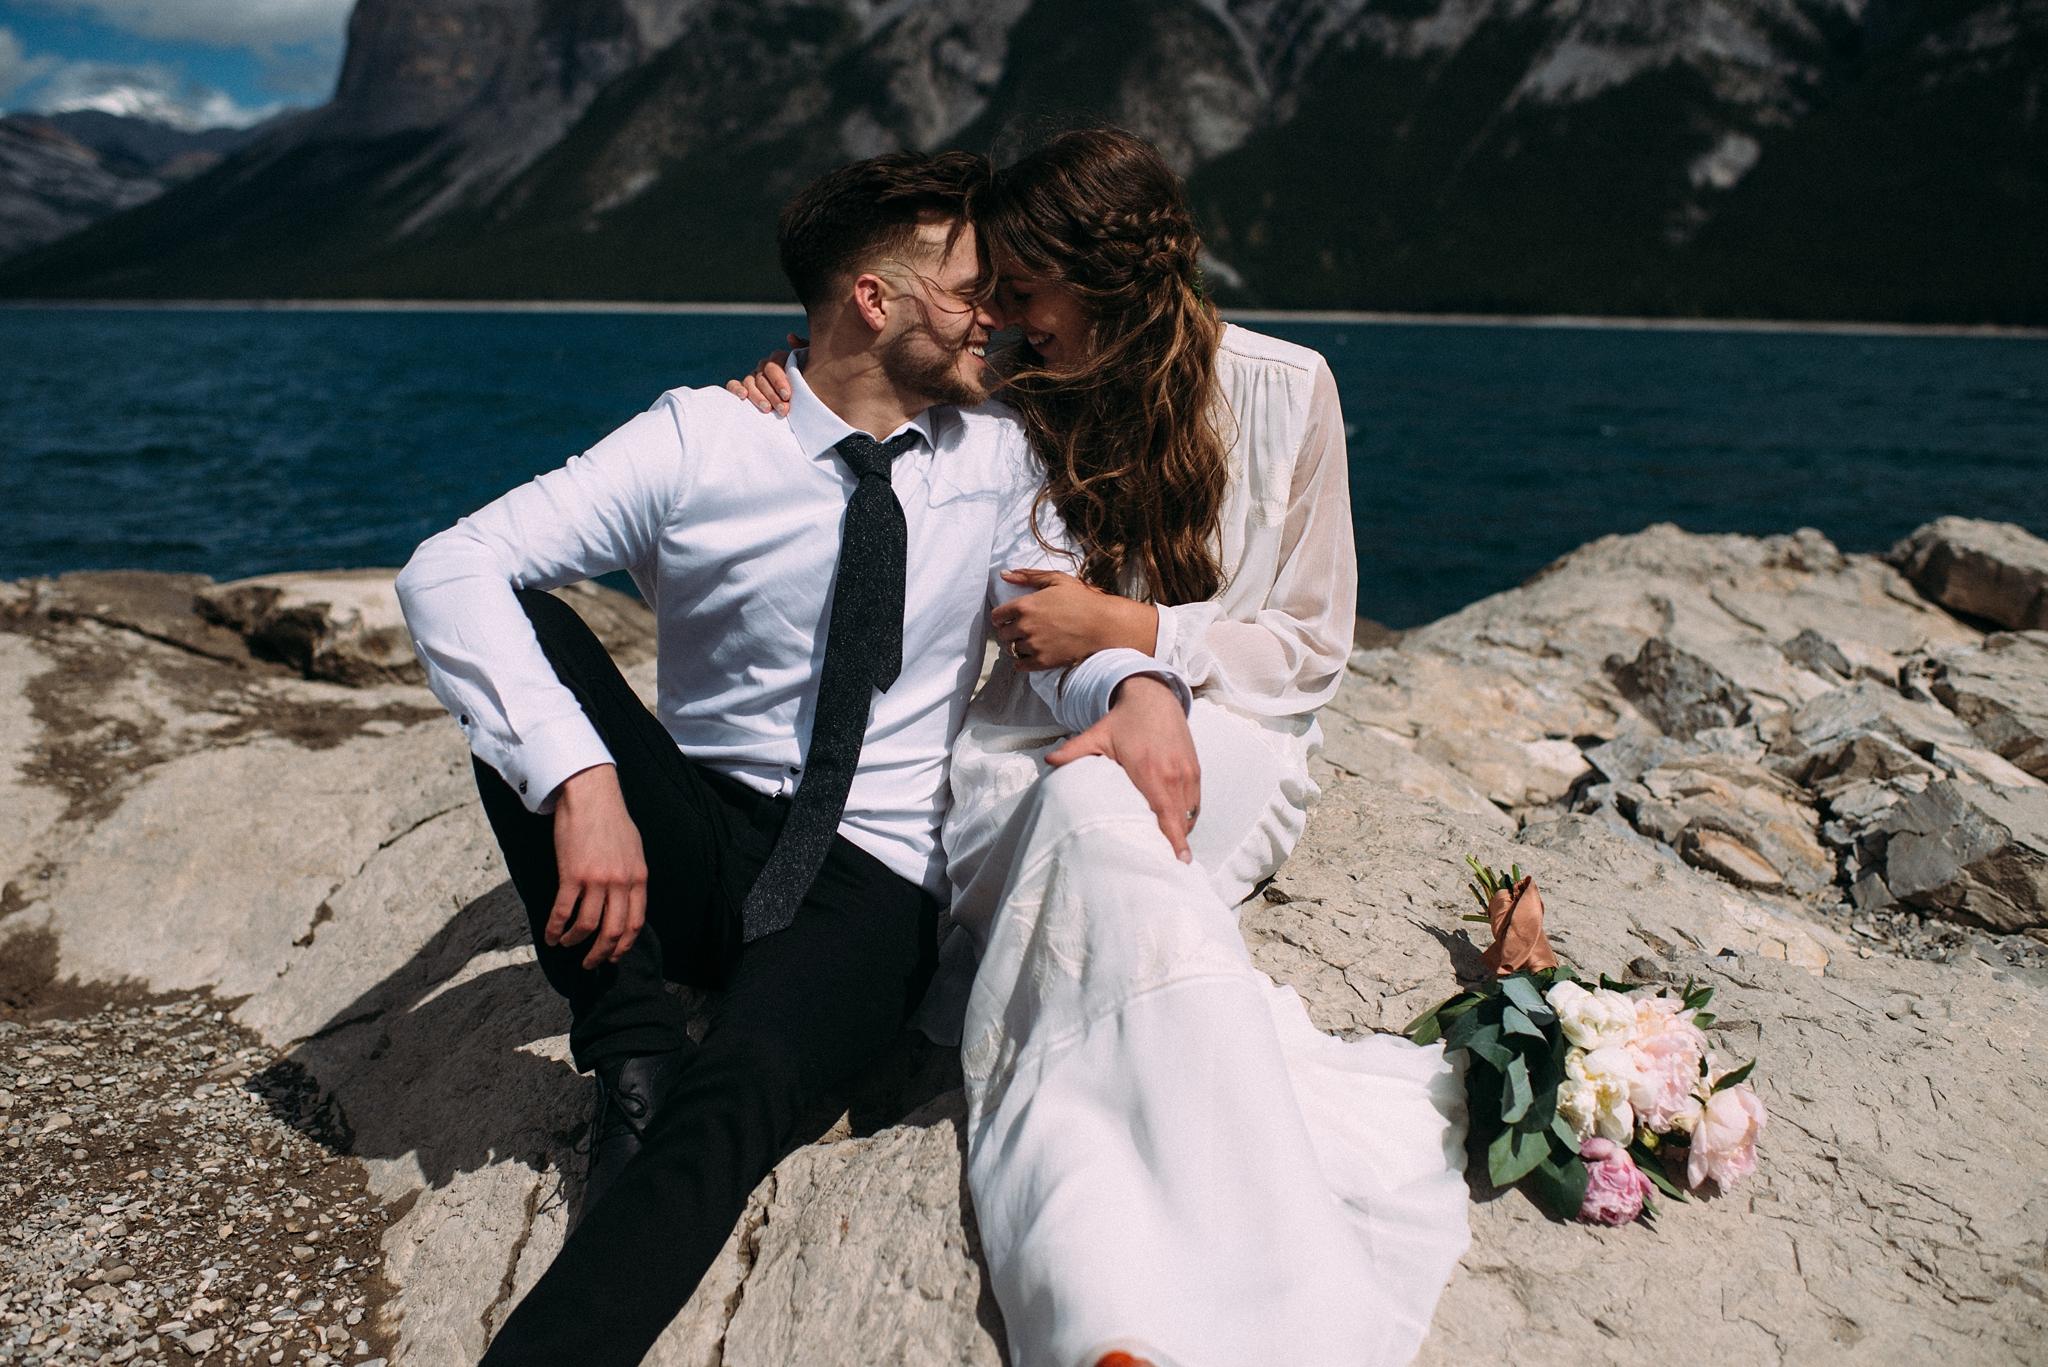 kaihla_tonai_intimate_wedding_elopement_photographer_4102